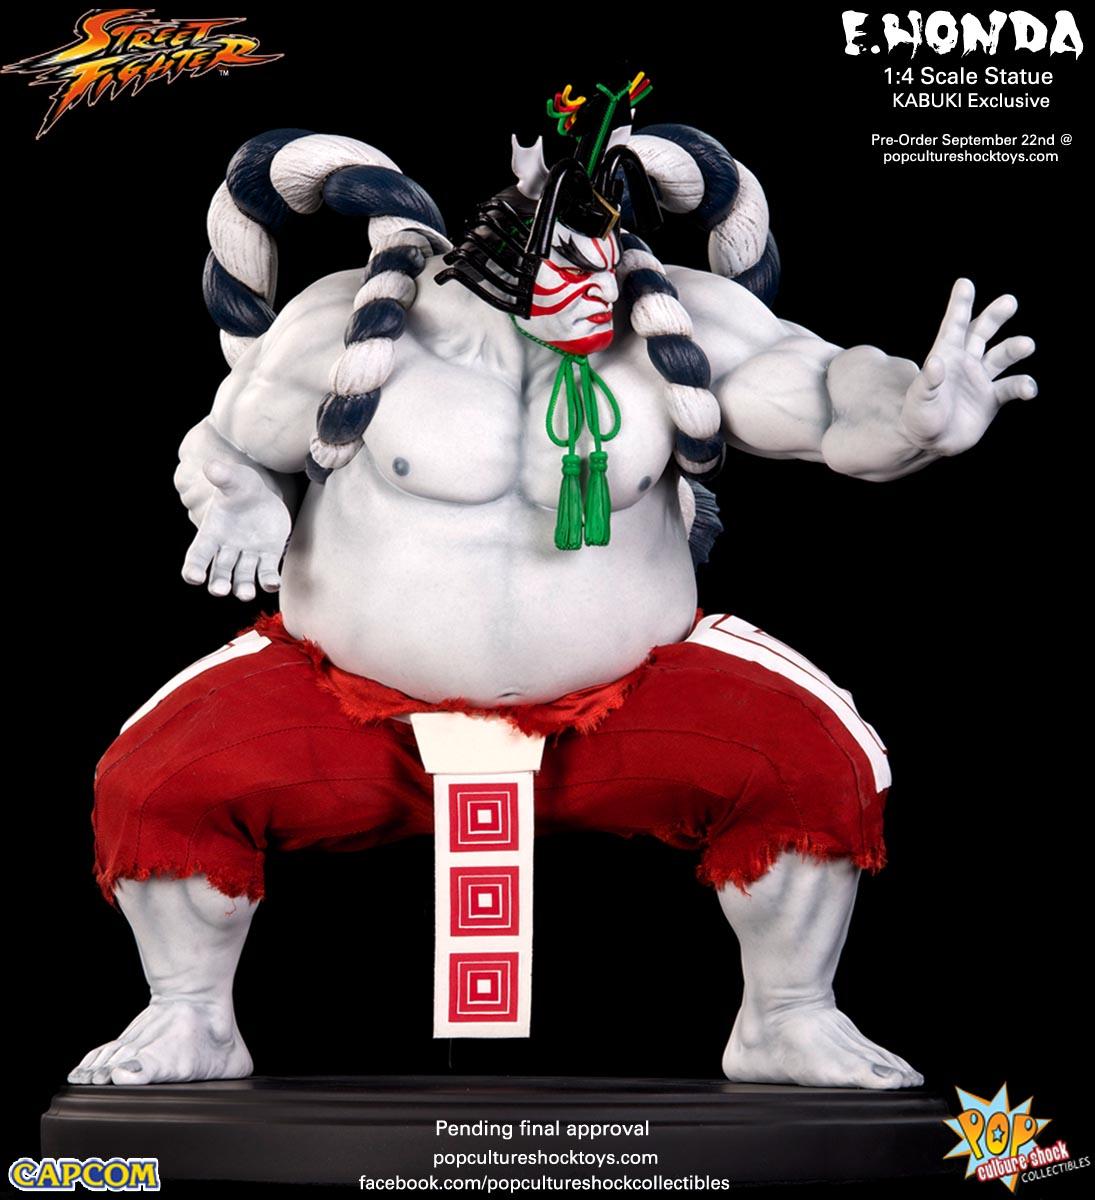 [Pop Culture Shock] Street Fighter: E. Honda 1/4 Statue - Página 3 Street-Fighter-E.-Honda-Kabuki-Statue-011